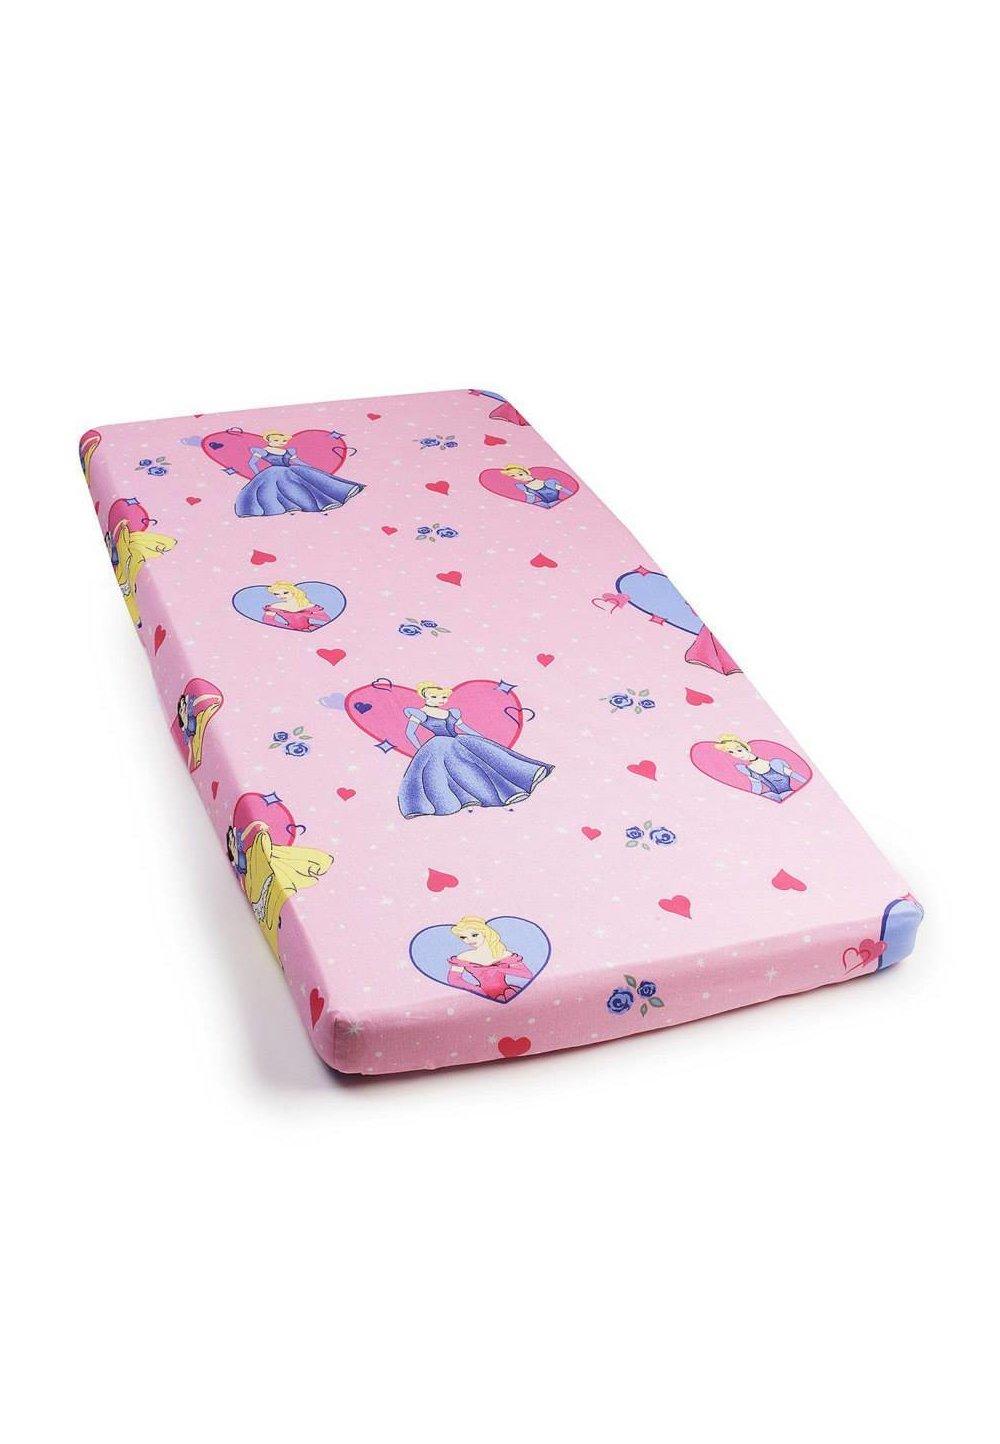 Cearceaf bumbac Printese, roz,120 X 60 cm imagine